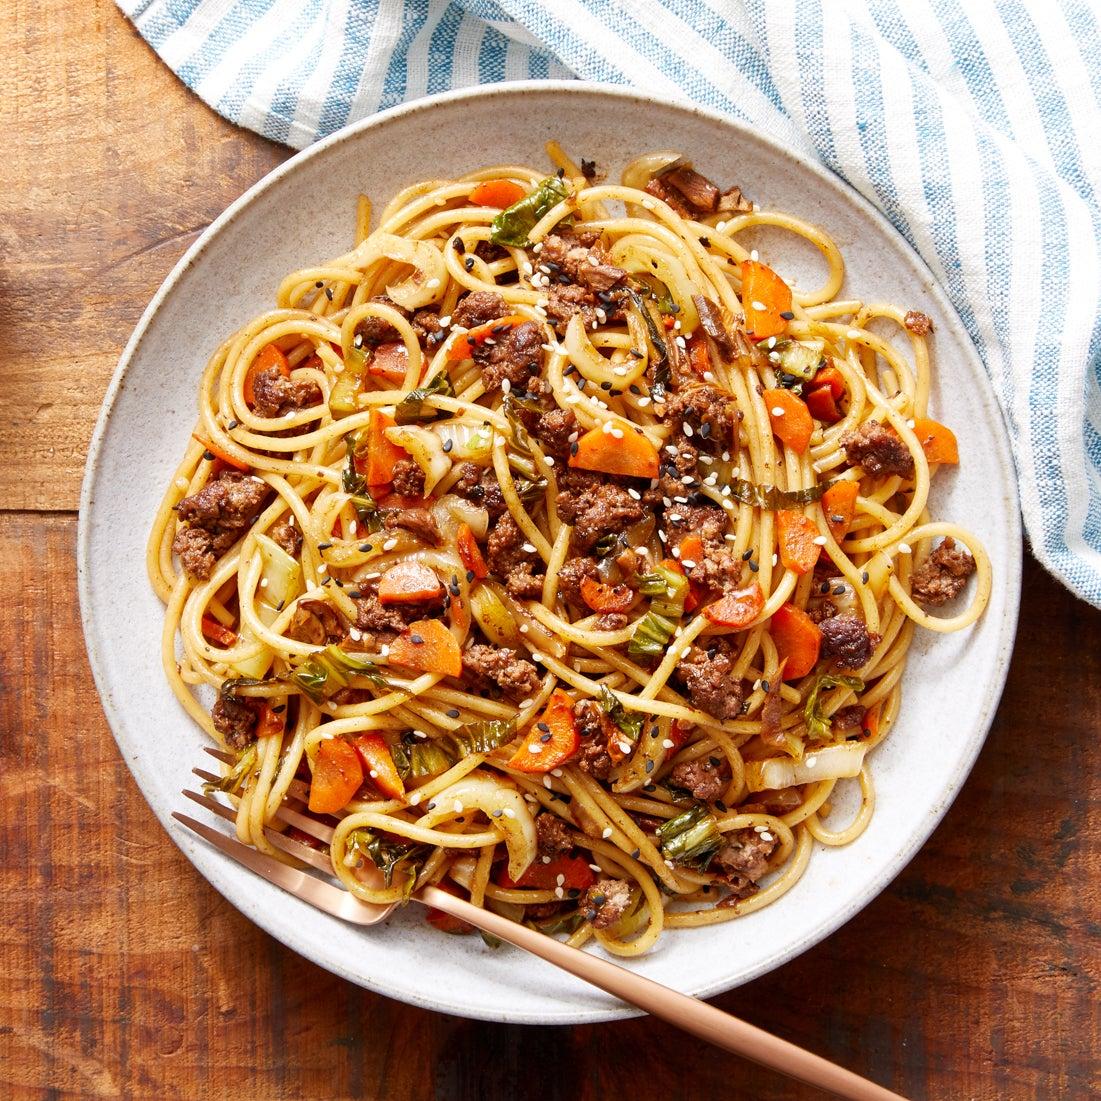 Beef & Shiitake Mushroom Noodles with Bok Choy & Carrots